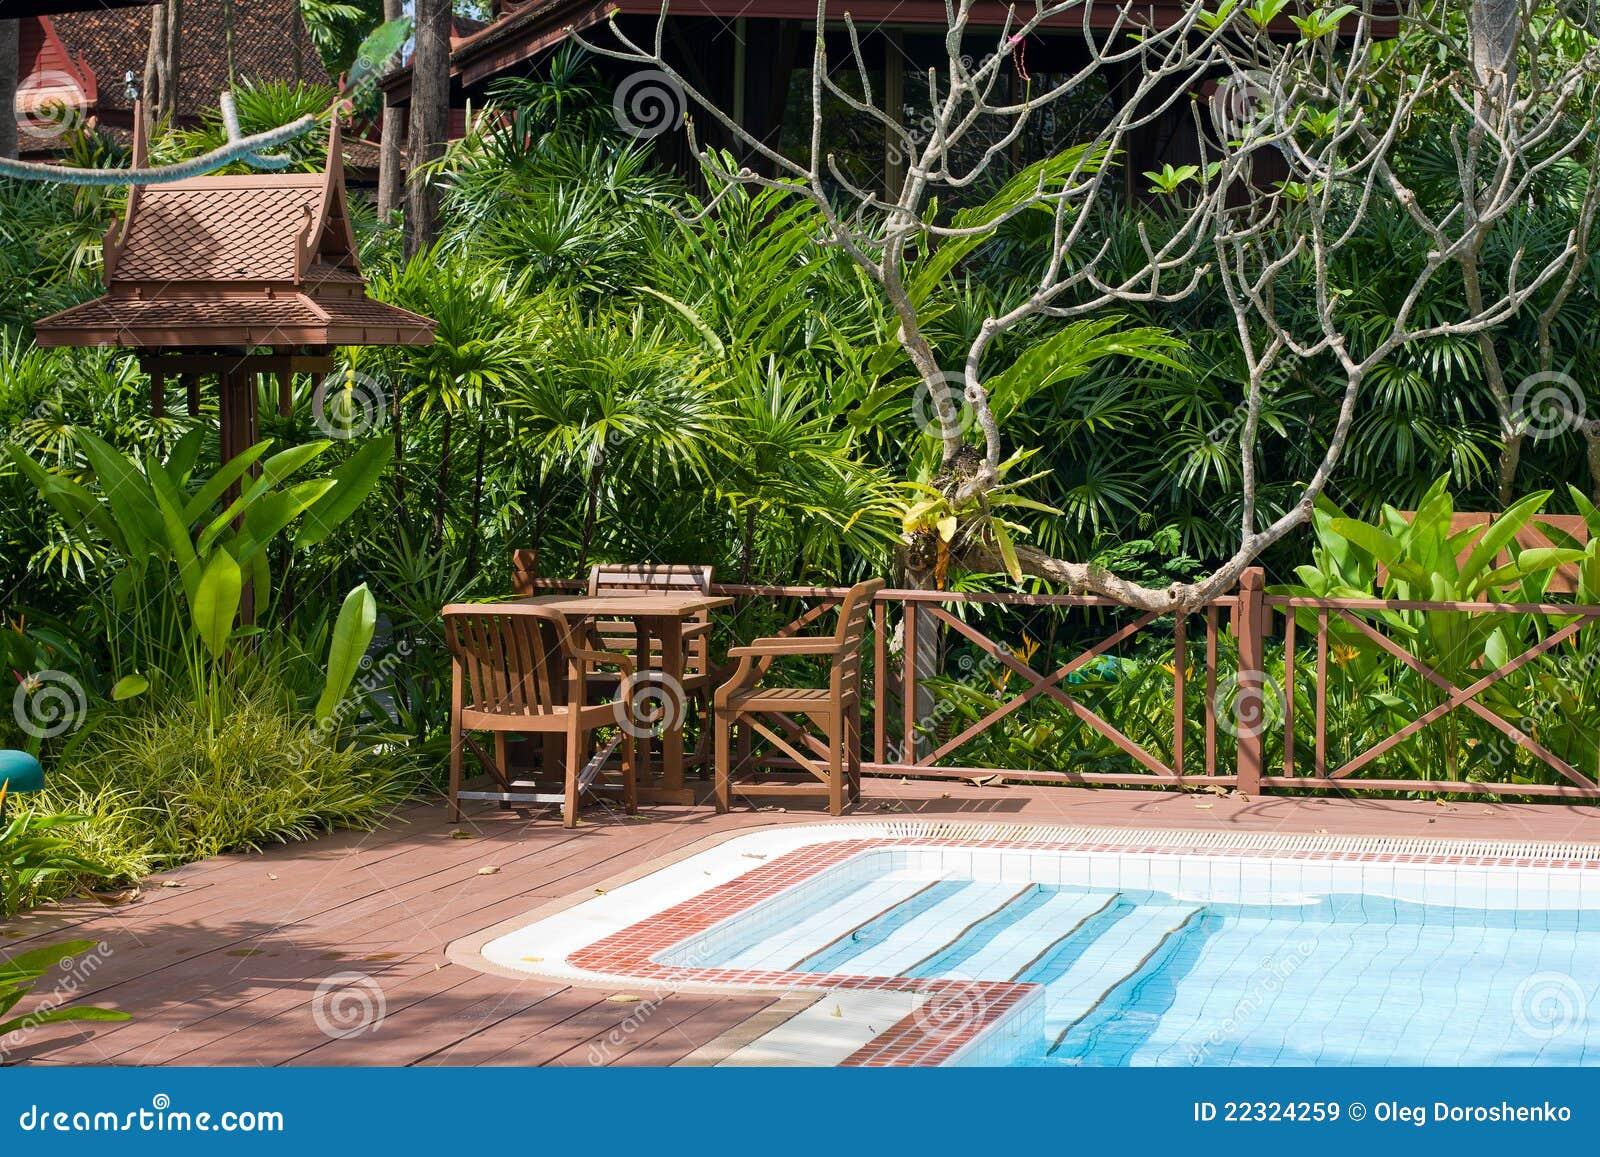 Swimming pool in garden royalty free stock images image for Swimming pools for your garden